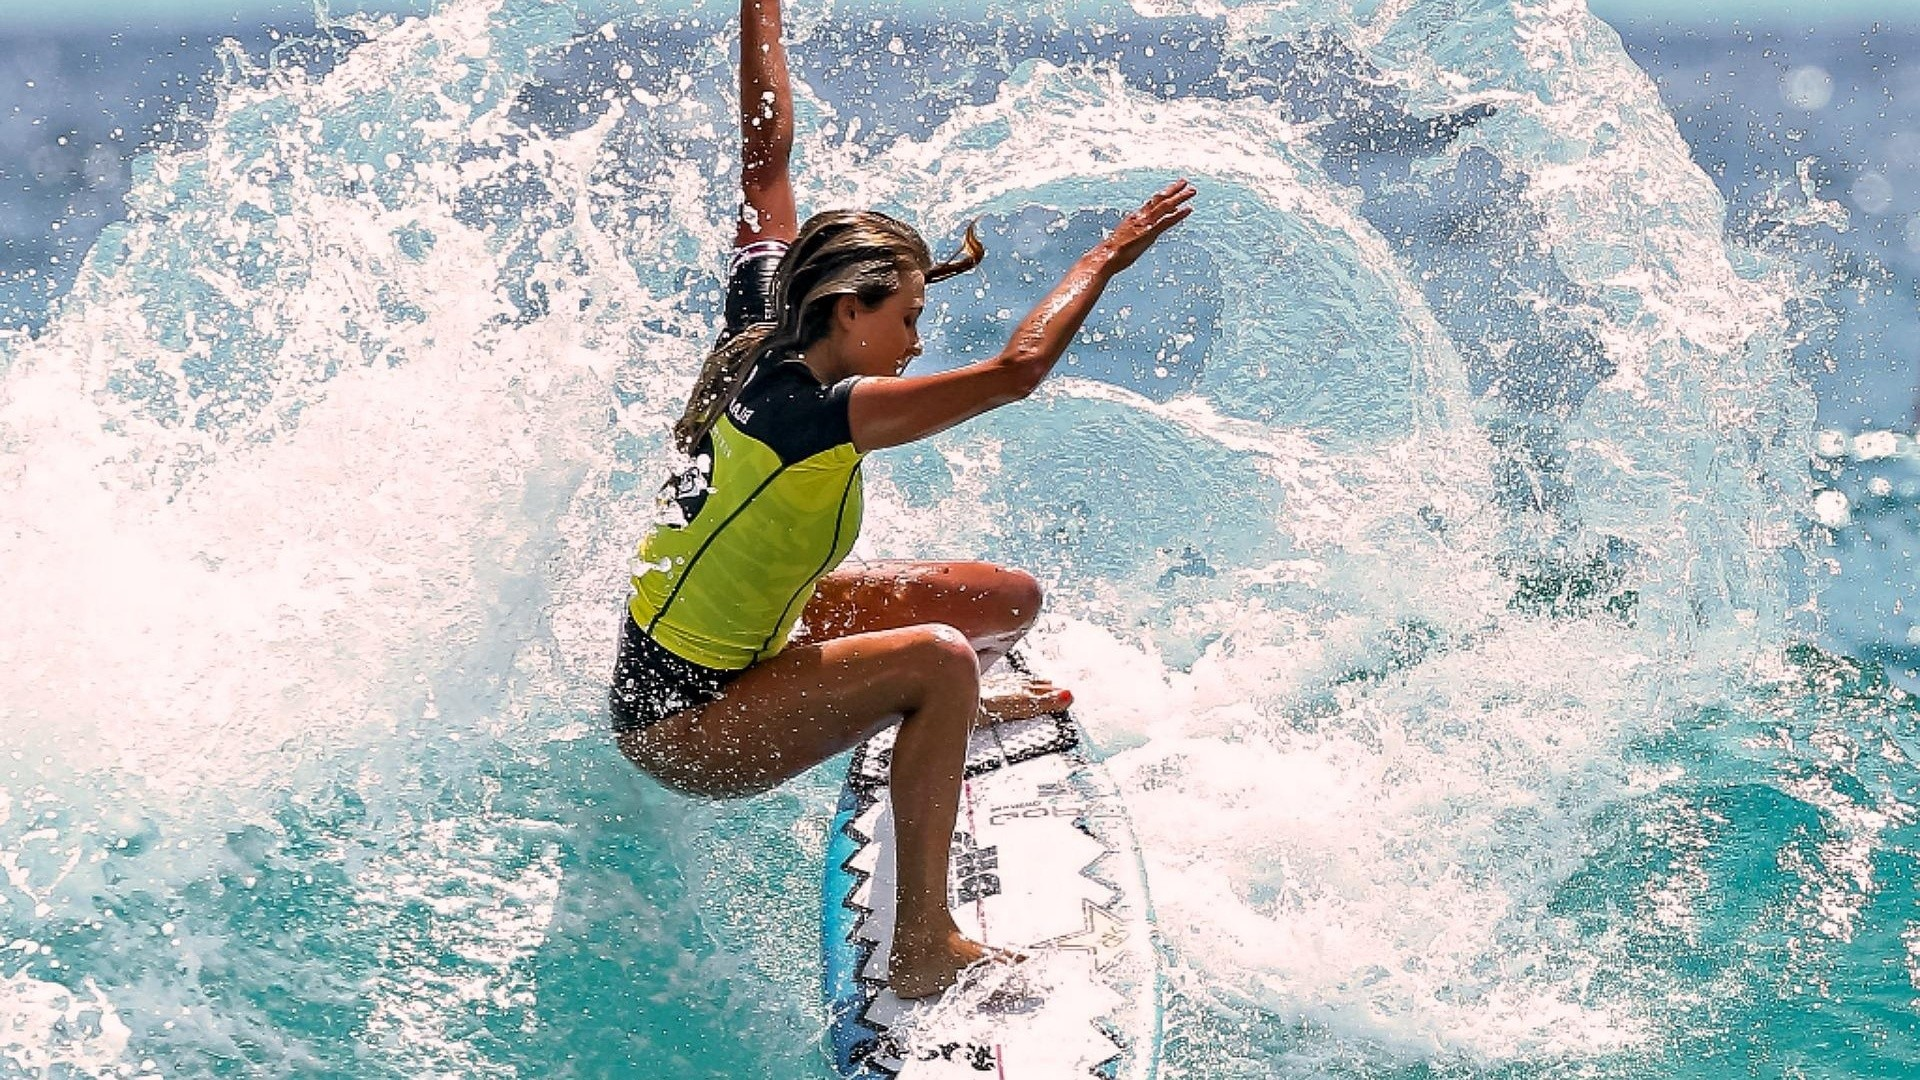 Motivational, Surfer, Surfing, Water Splashing, Surfer Girl, Alana  Blanchard, Alana